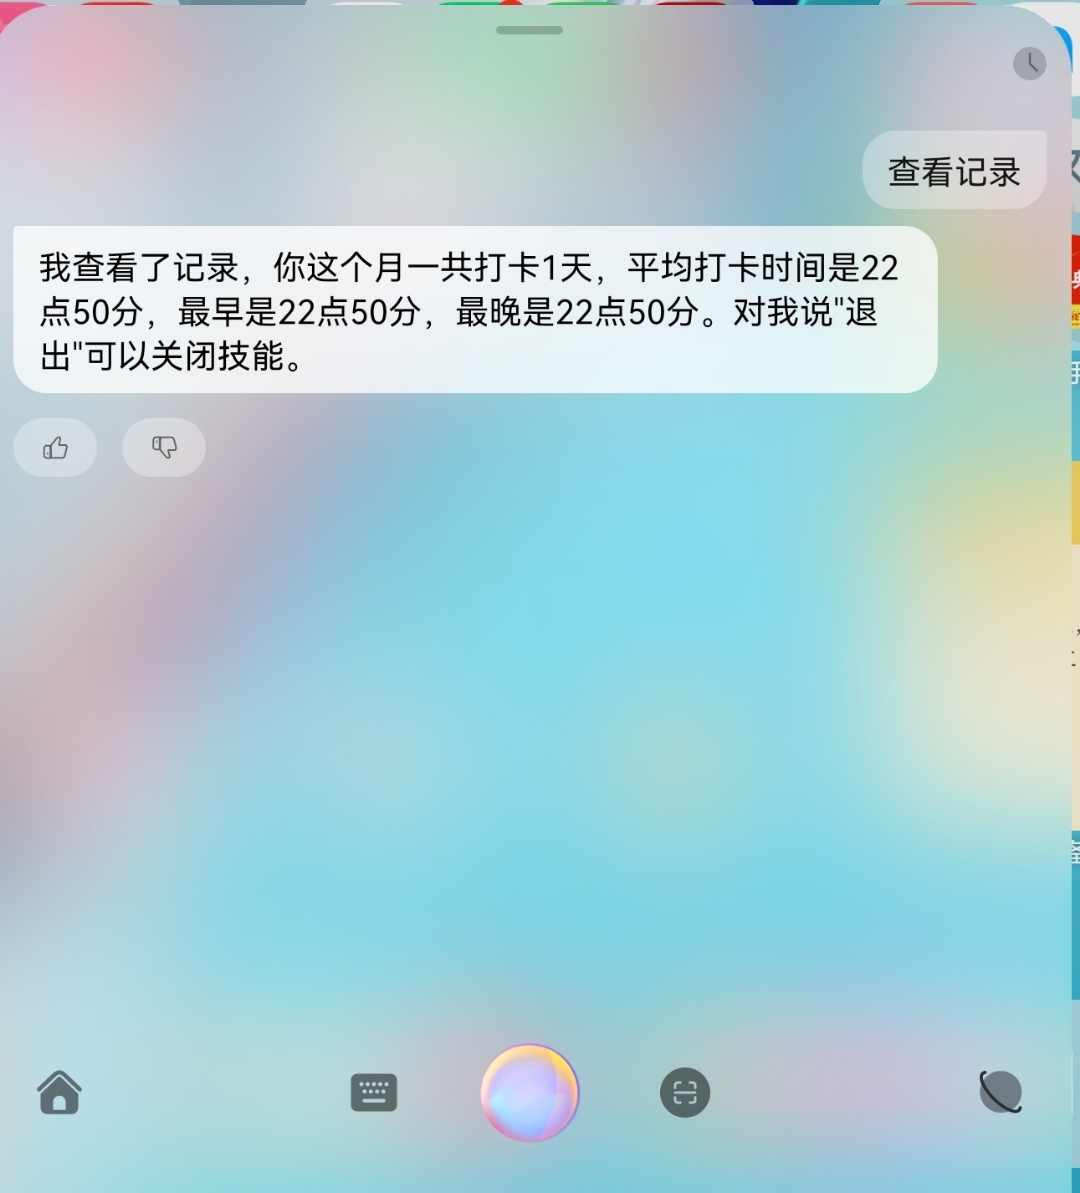 Screenshot_20210909_225048_com.huawei.android.launcher_edit_26545499099507.jpg